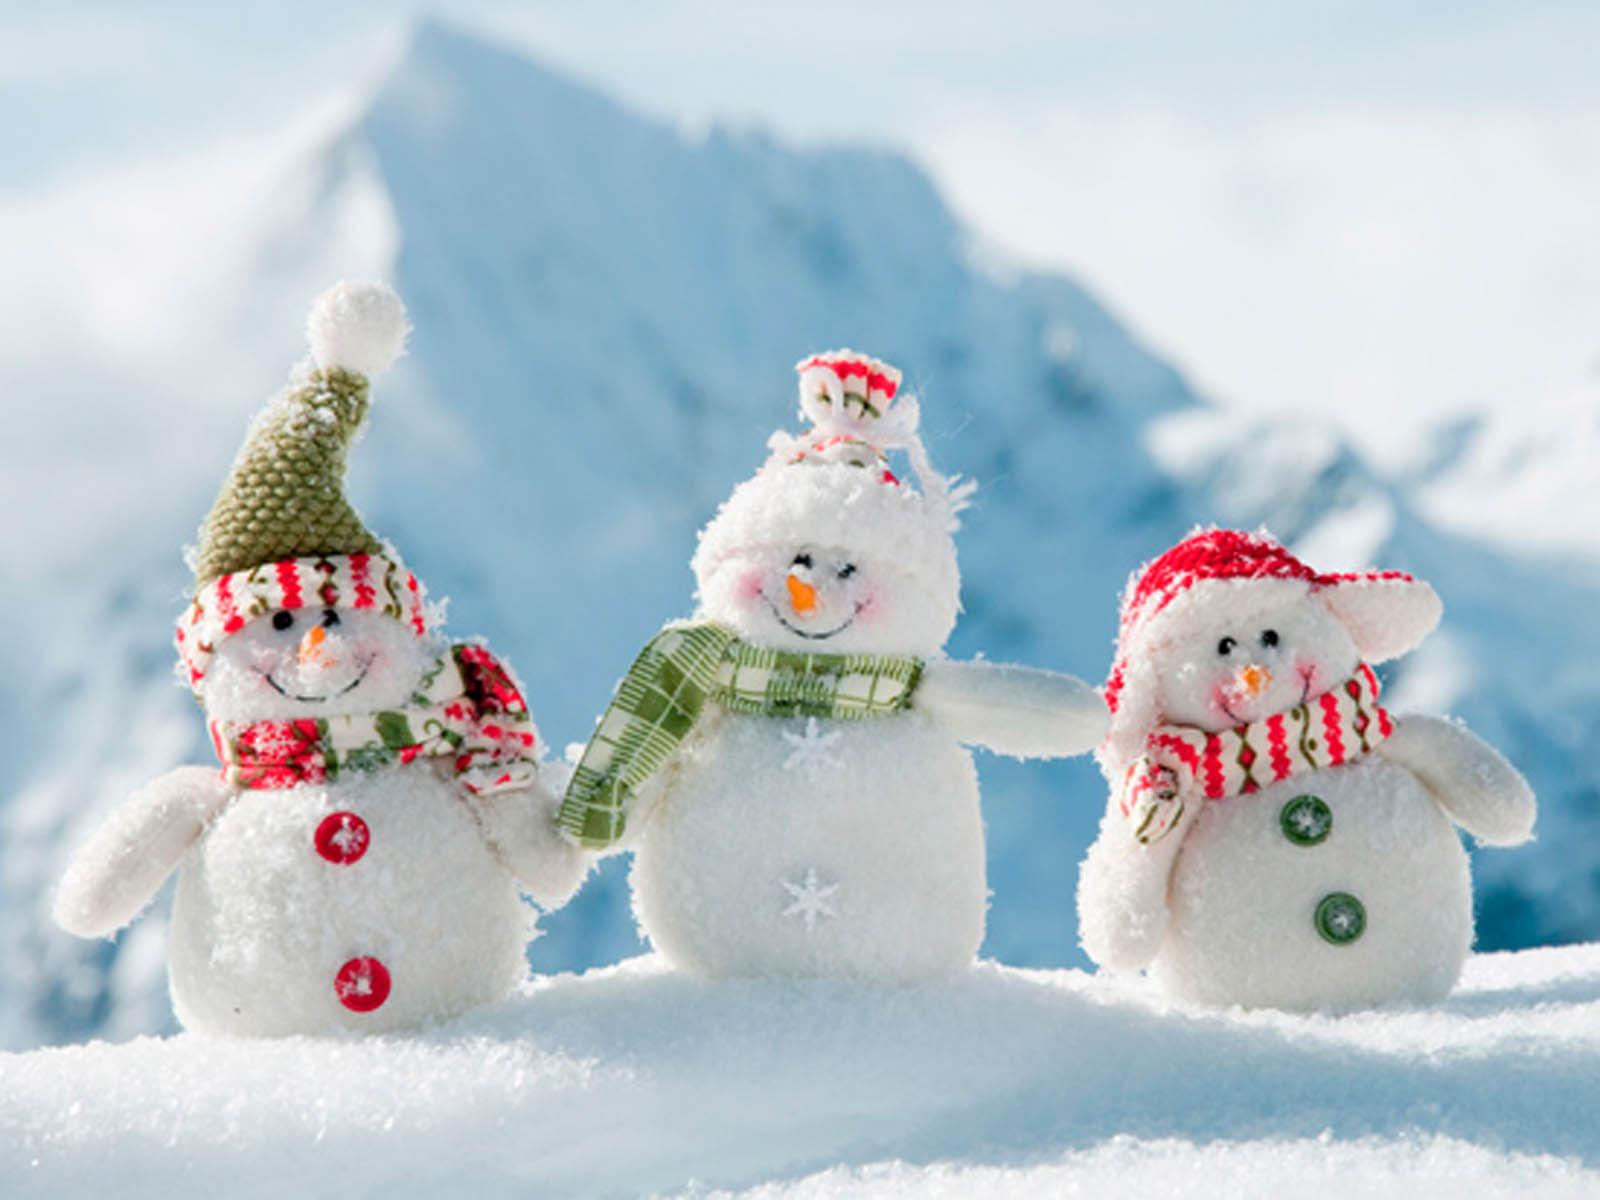 Snowman desktop backgrounds Desktop Backgrounds 2019 1600x1200